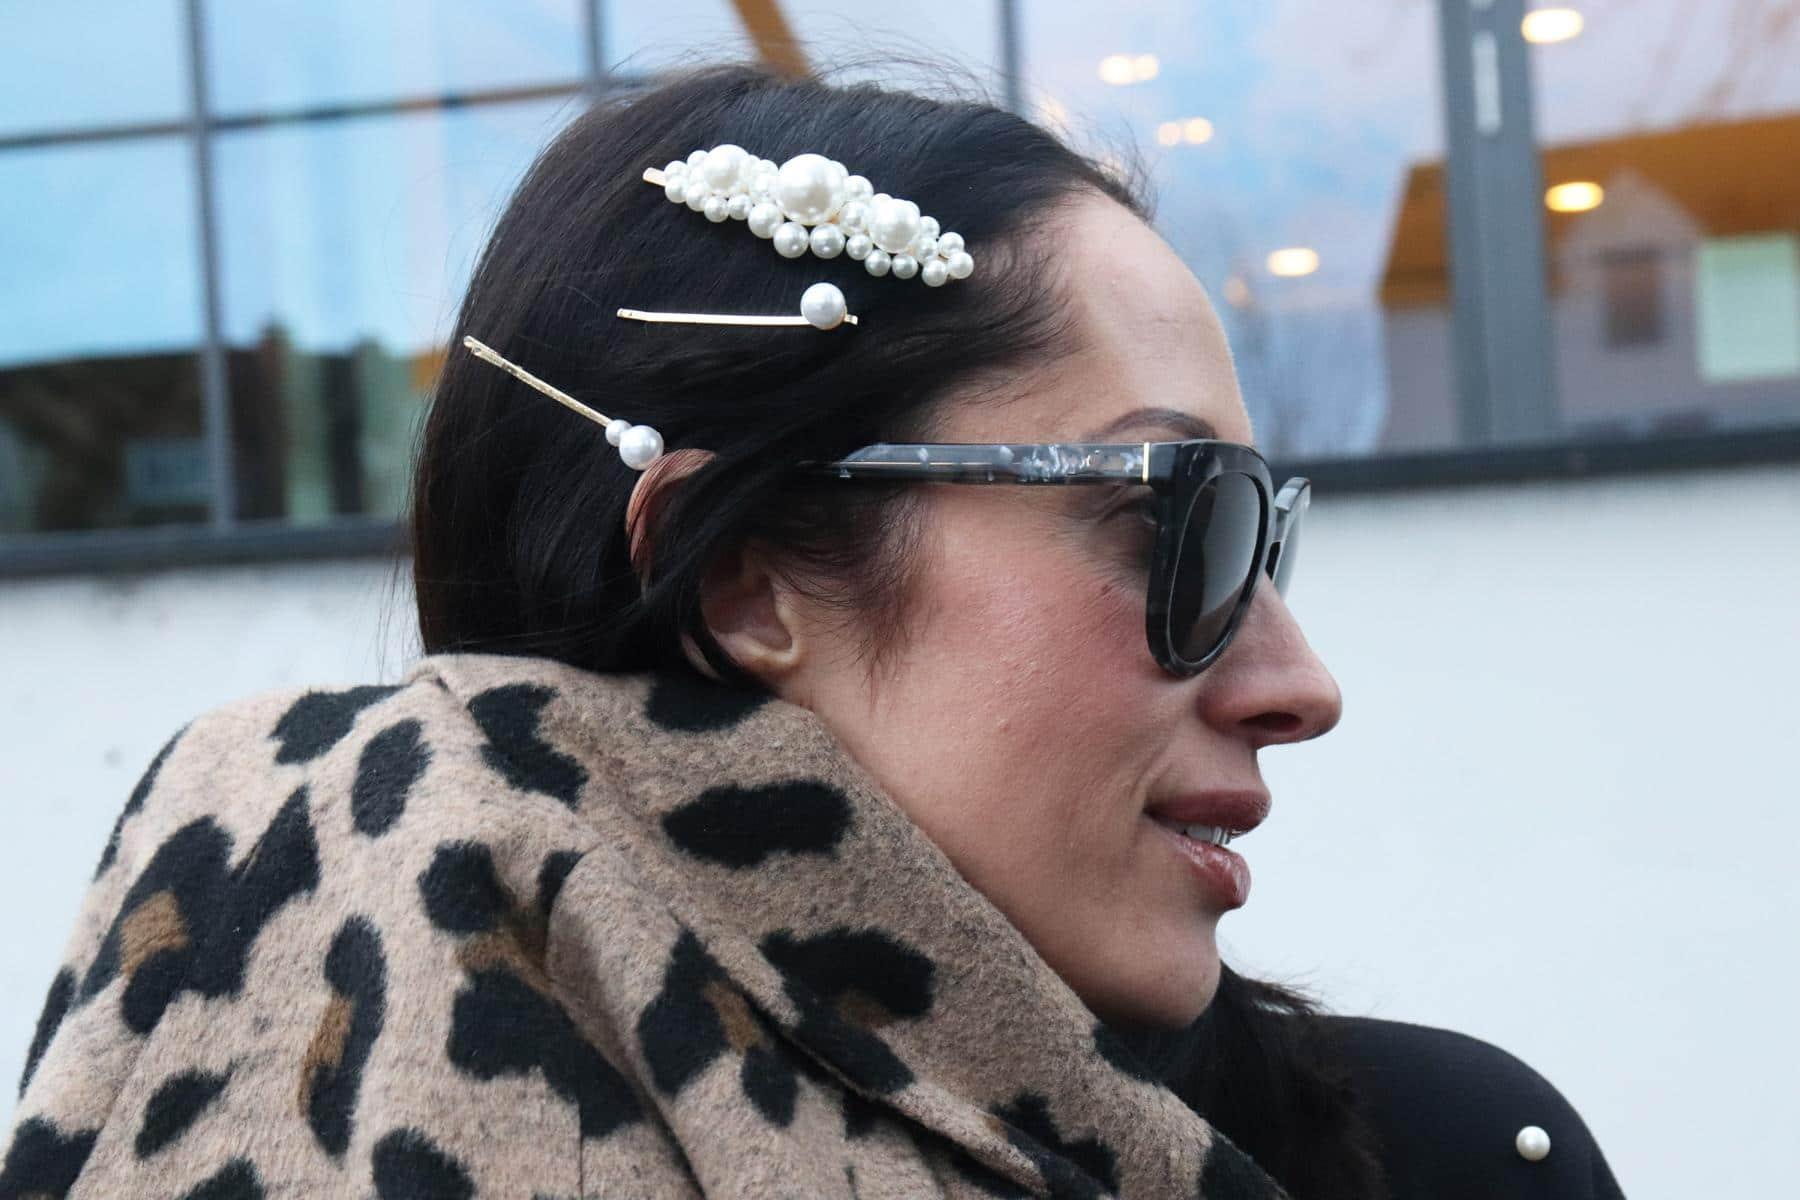 Haarspangen als Schmuckstück: So geht`s